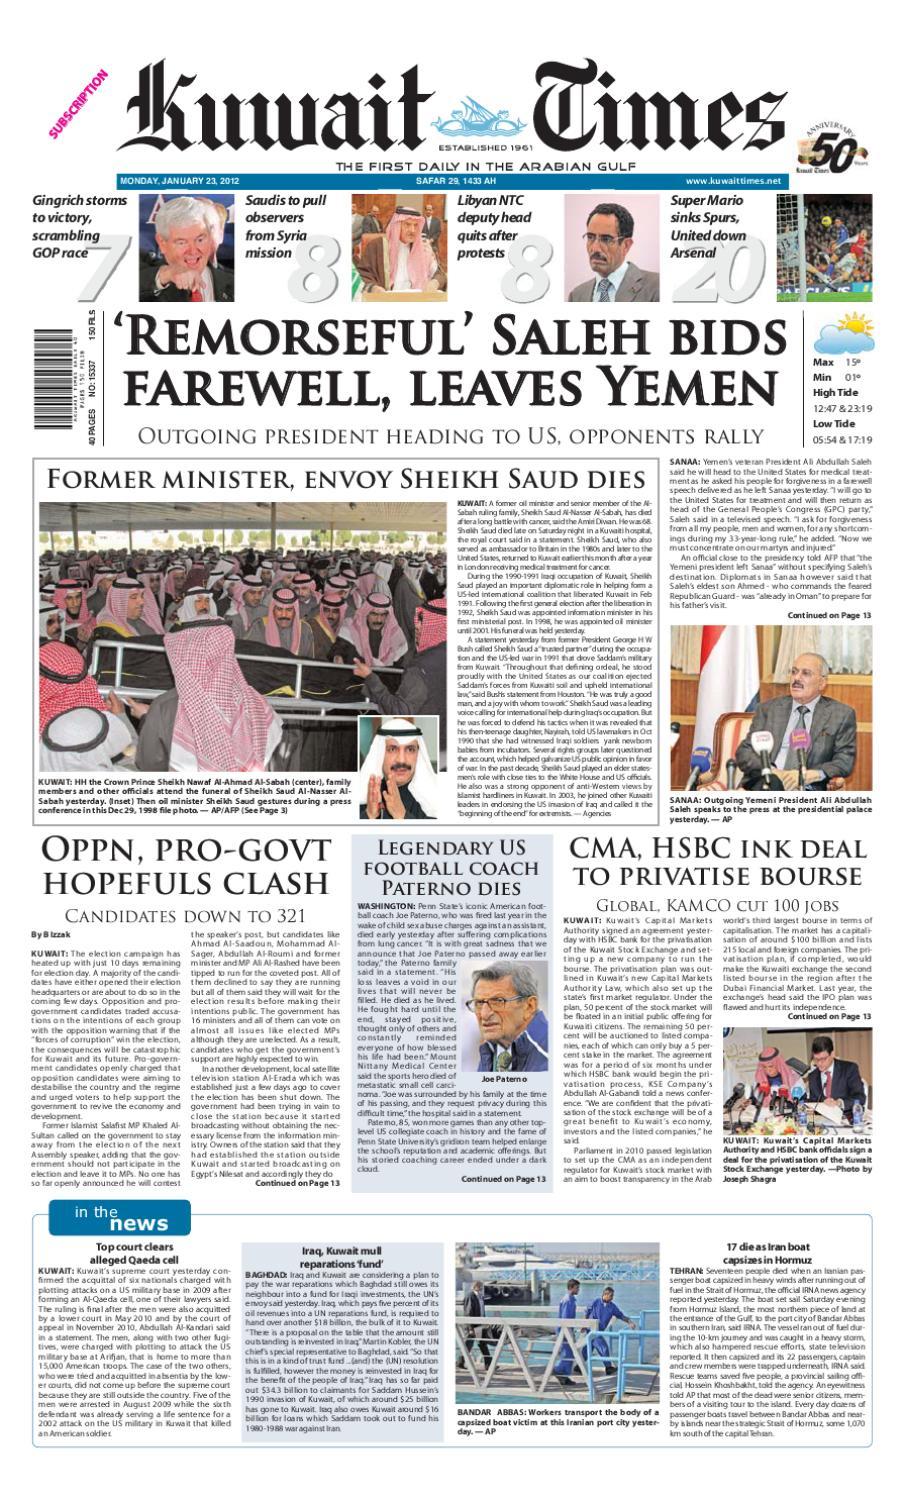 23 Jan 2012 by Kuwait Times - issuu